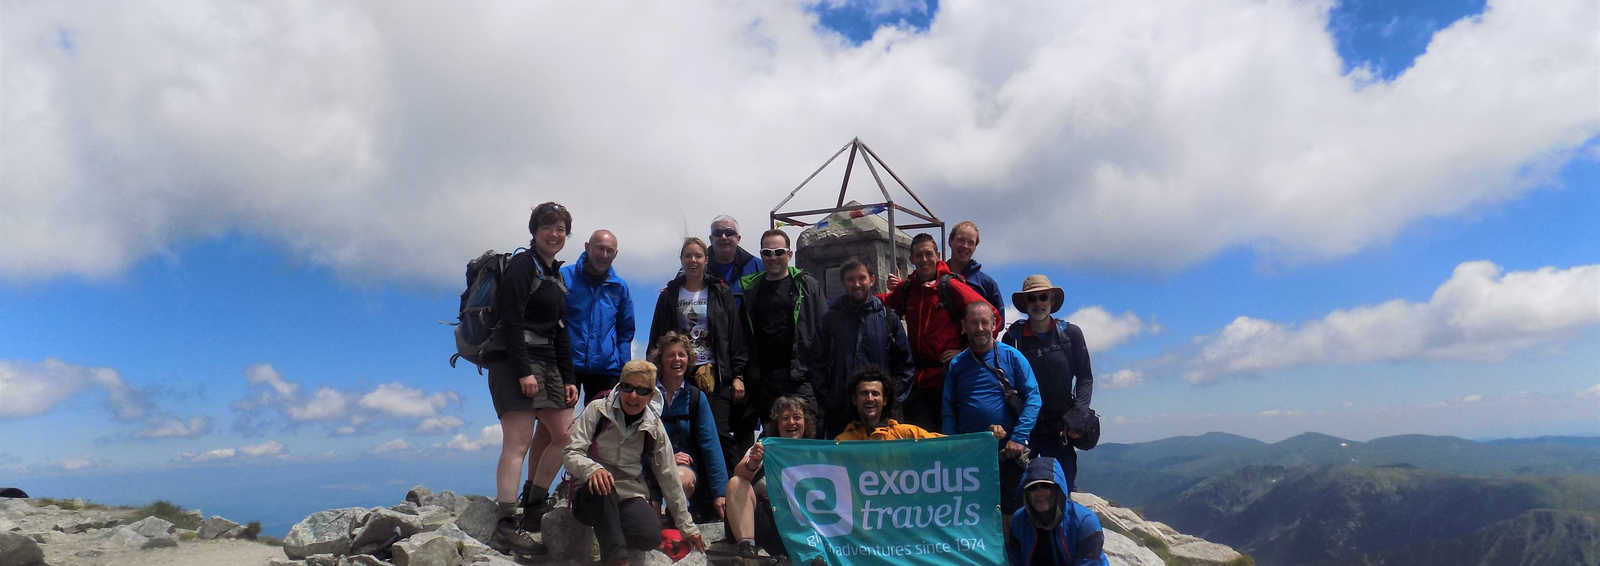 At the summit of Mount Musala 2925m, Bulgaria's highest peak